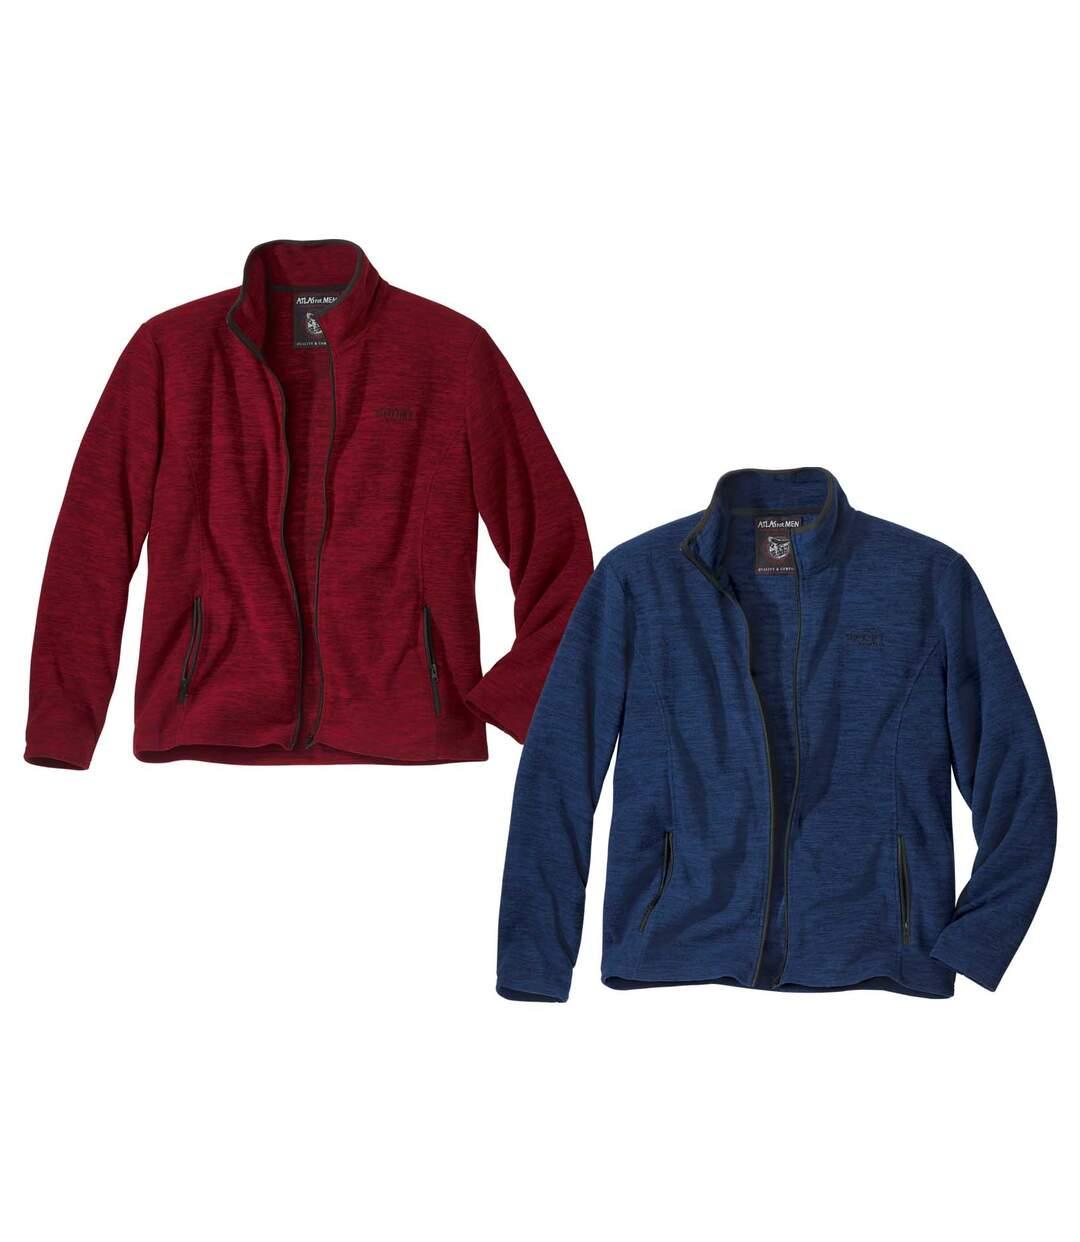 Pack of 2 Men's Mottled Microfleece Jackets - Blue Red